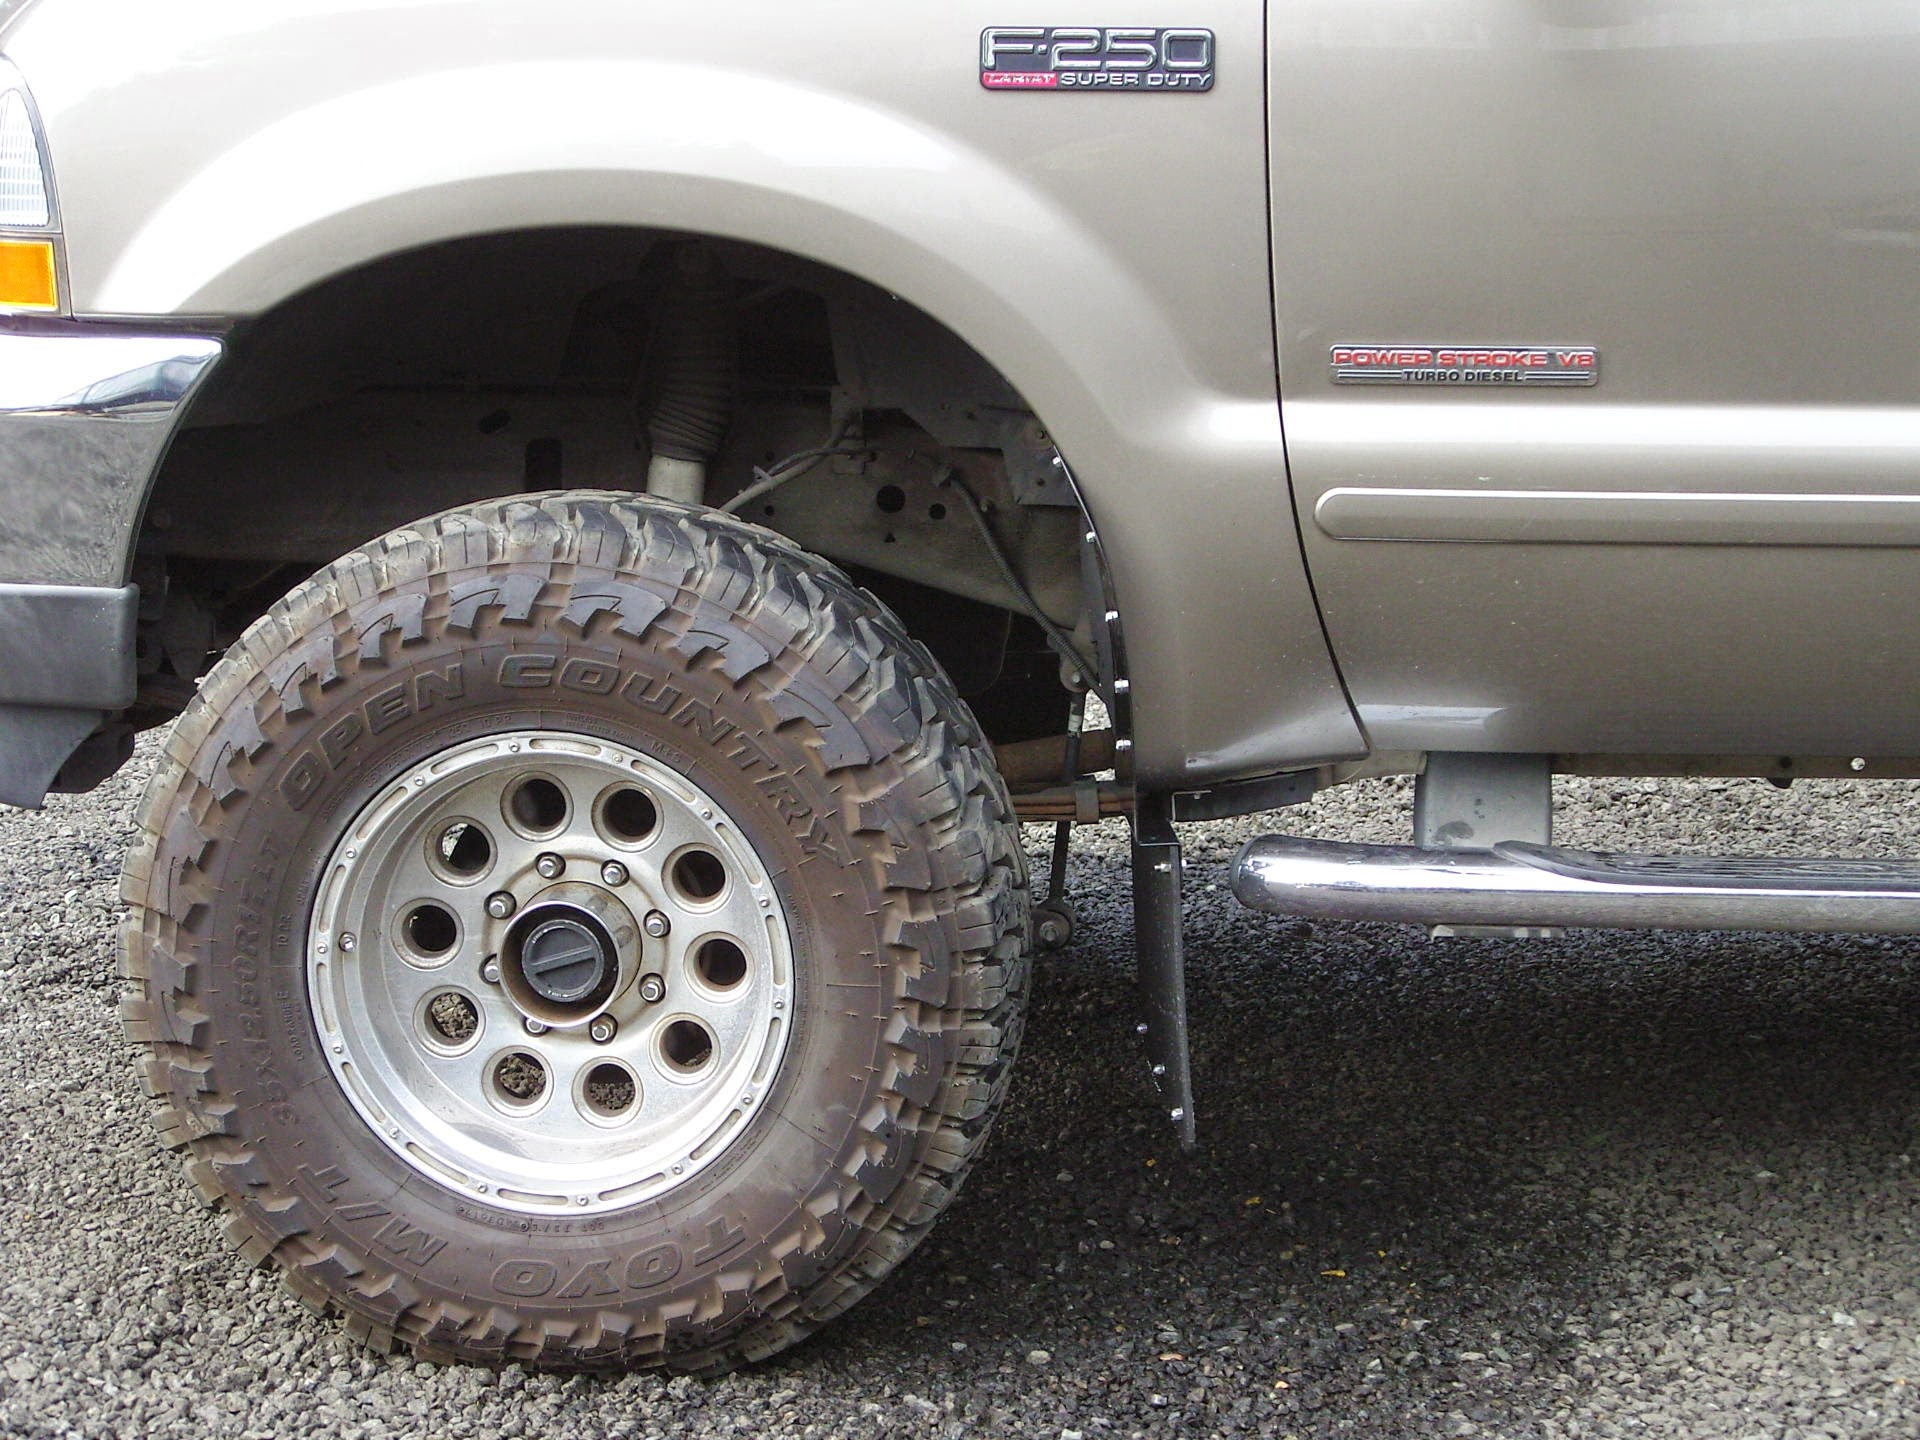 Lifted Truck Mud Flap Brackets The Best Truck 2018